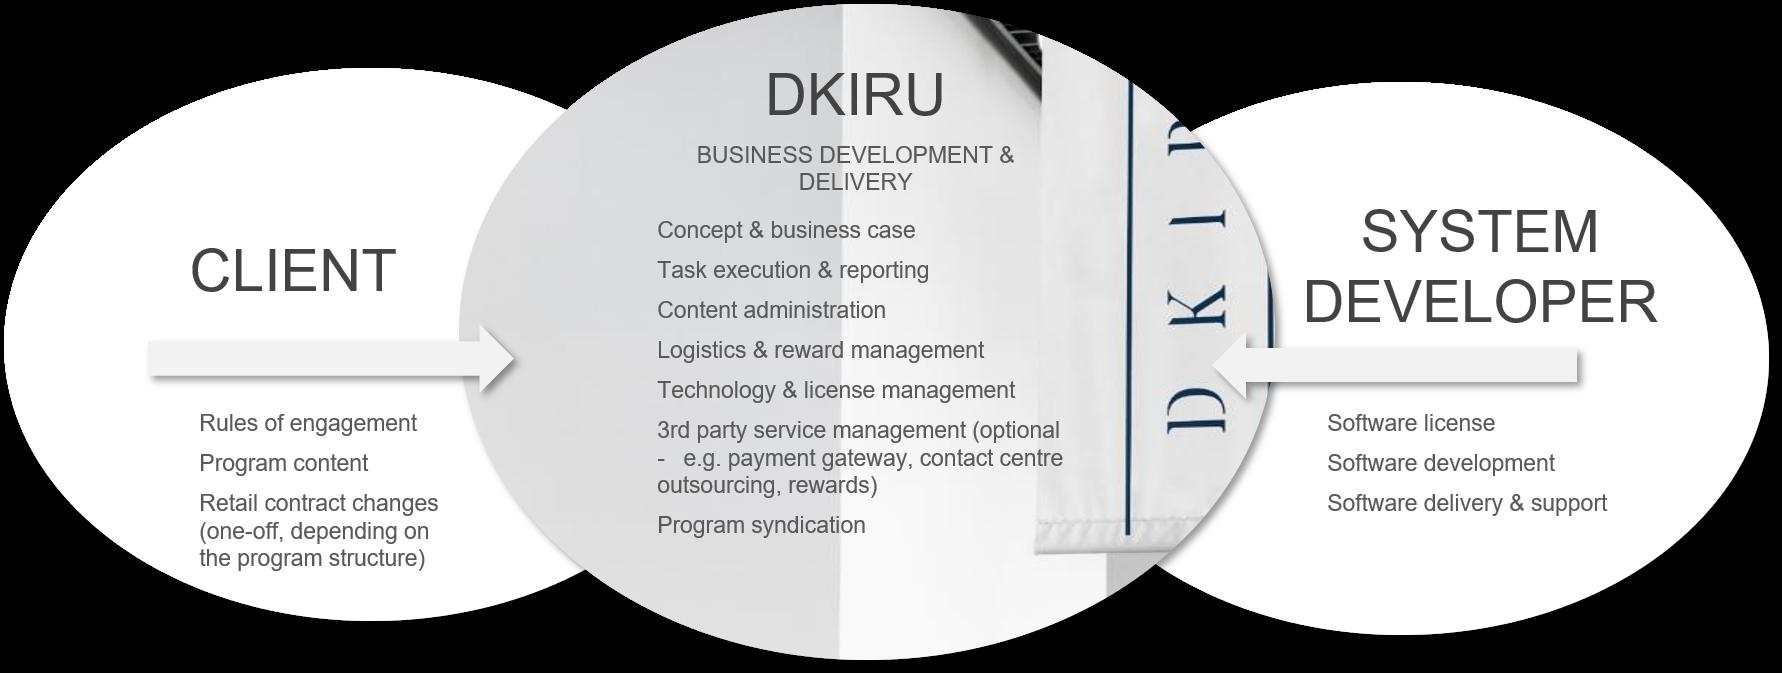 Dkiru operating model